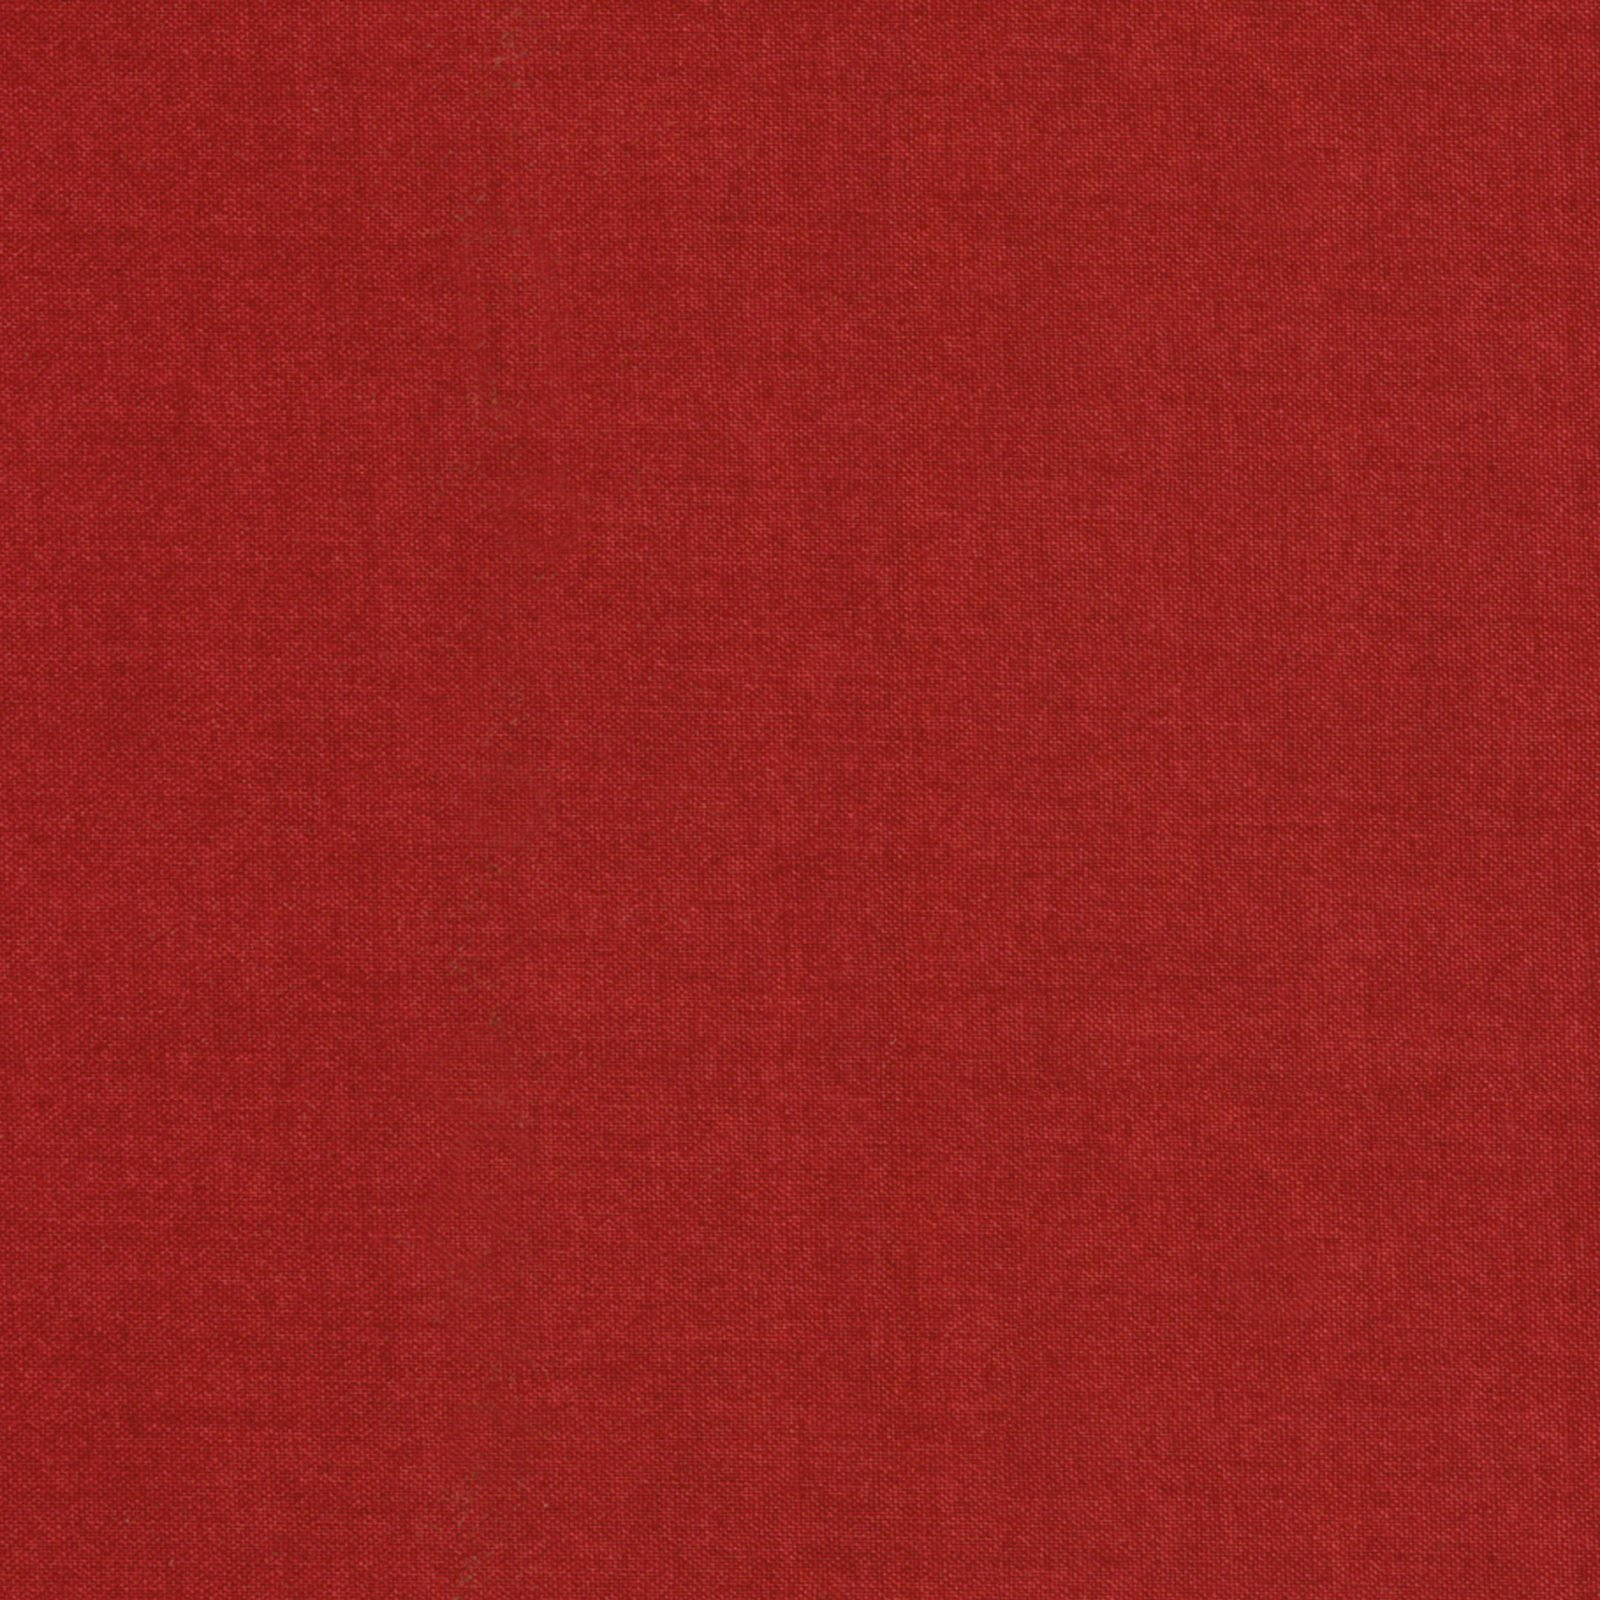 Linen Textures R